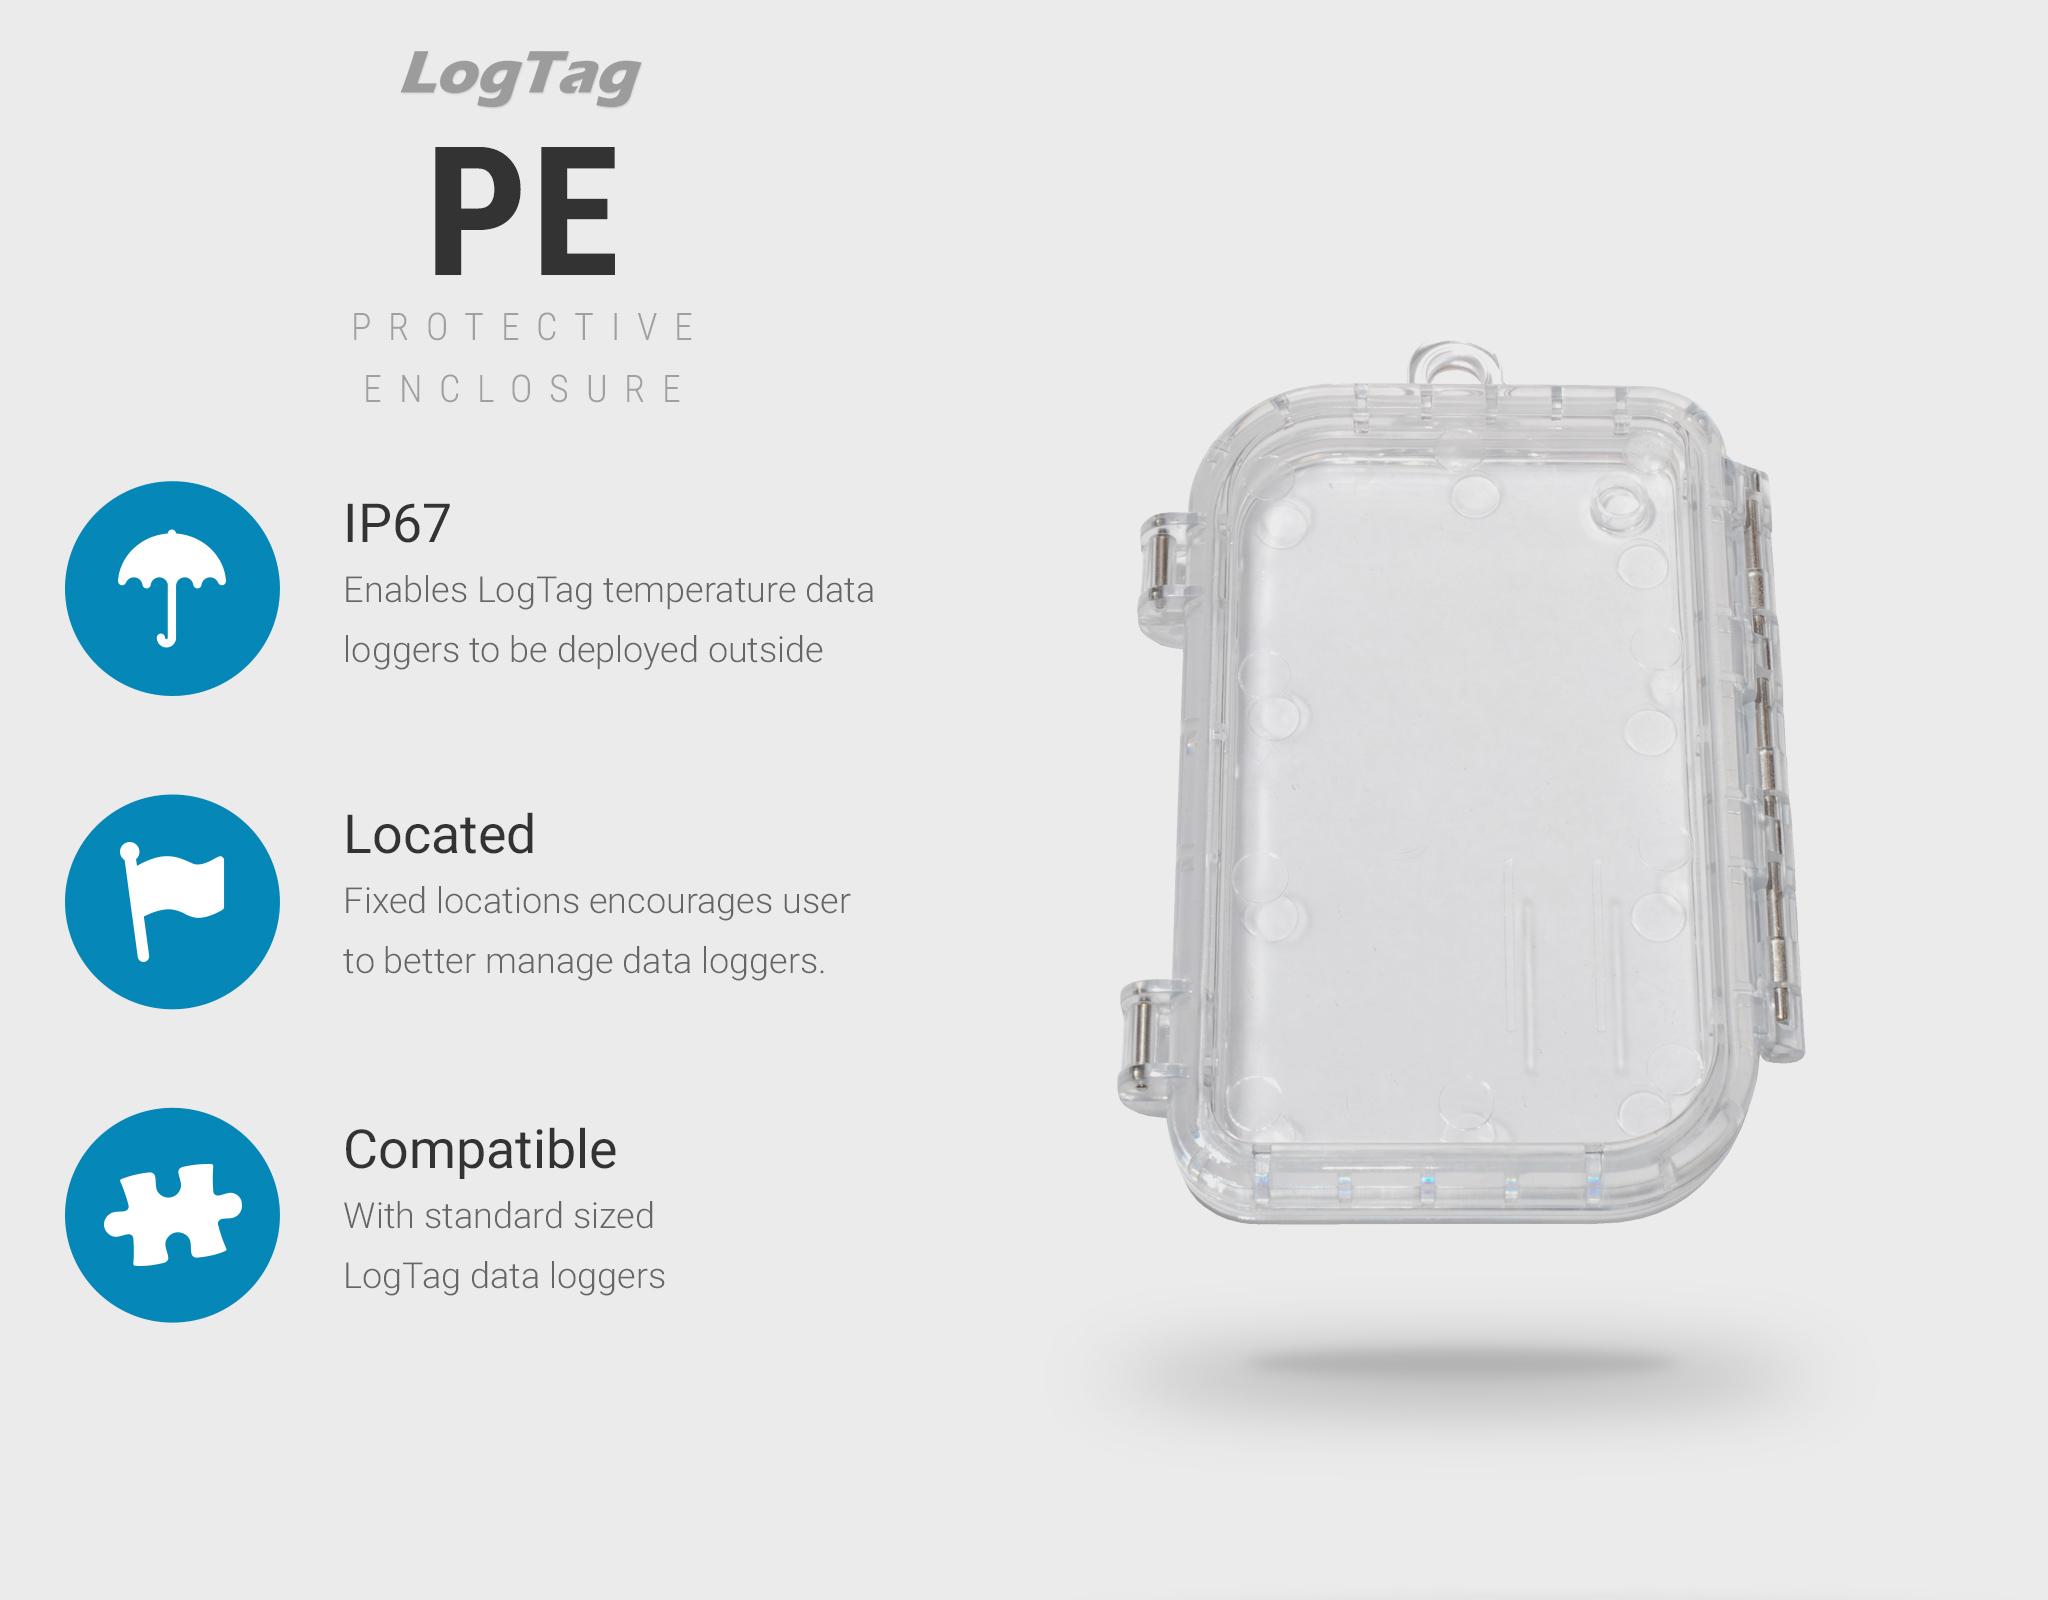 pe-protective-enclosure-case